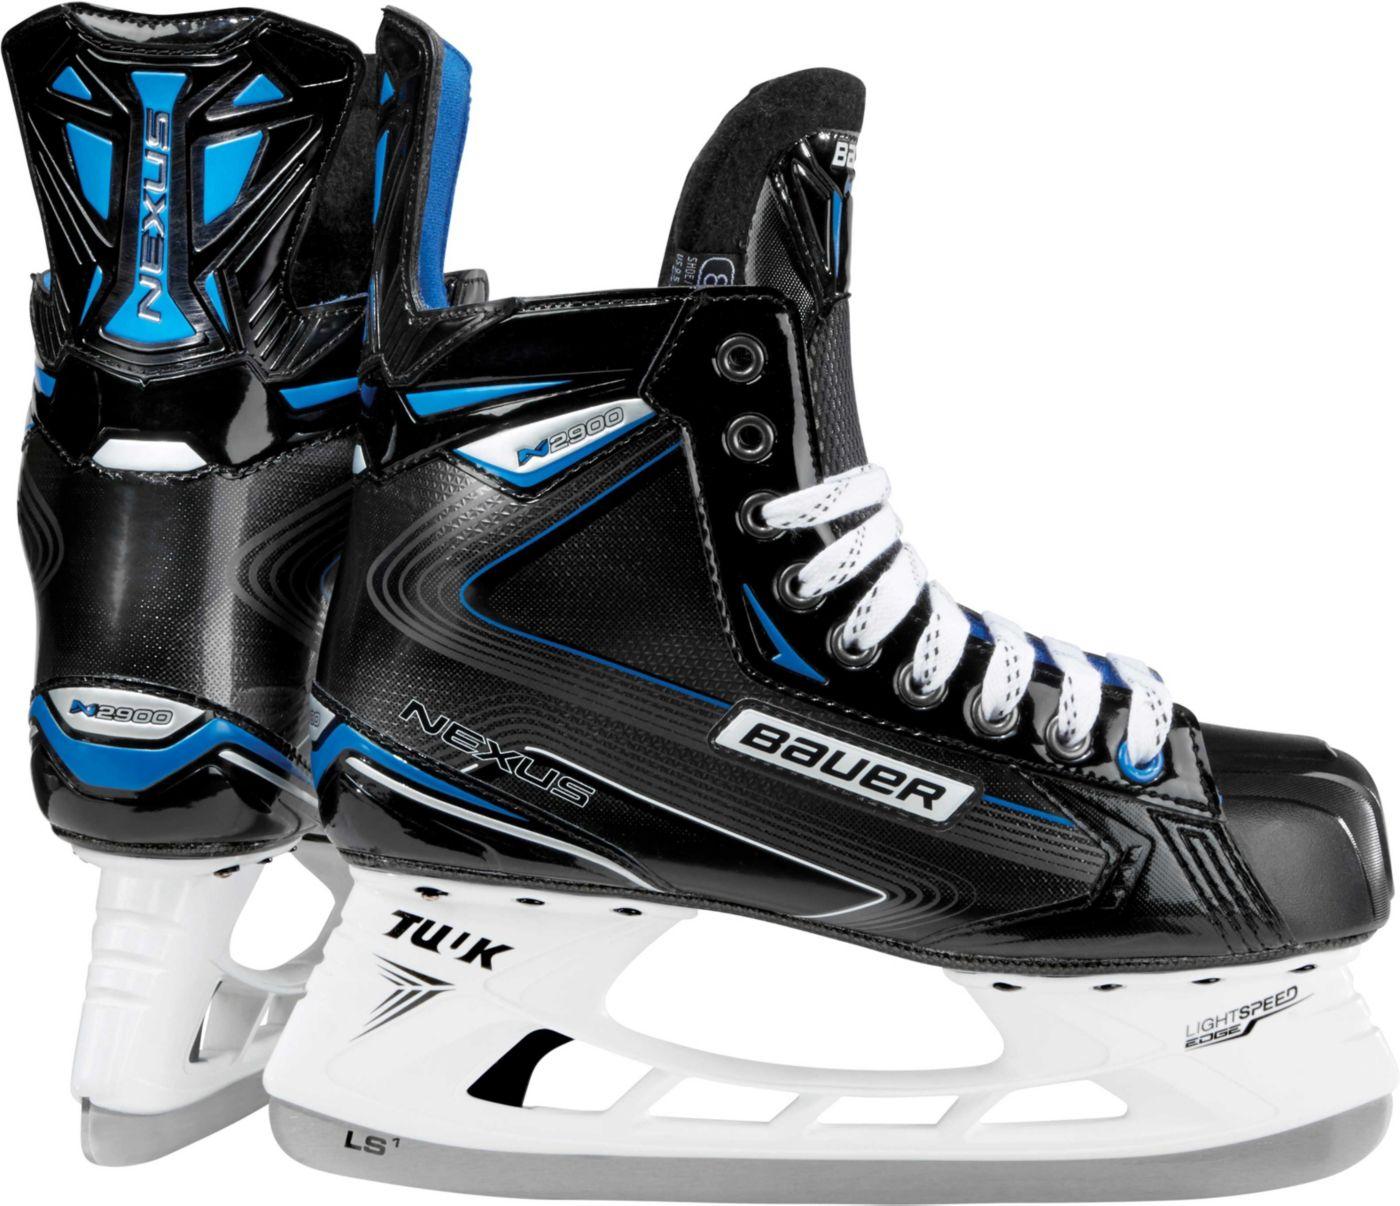 Bauer Senior NEXUS 2900 Ice Hockey Skates